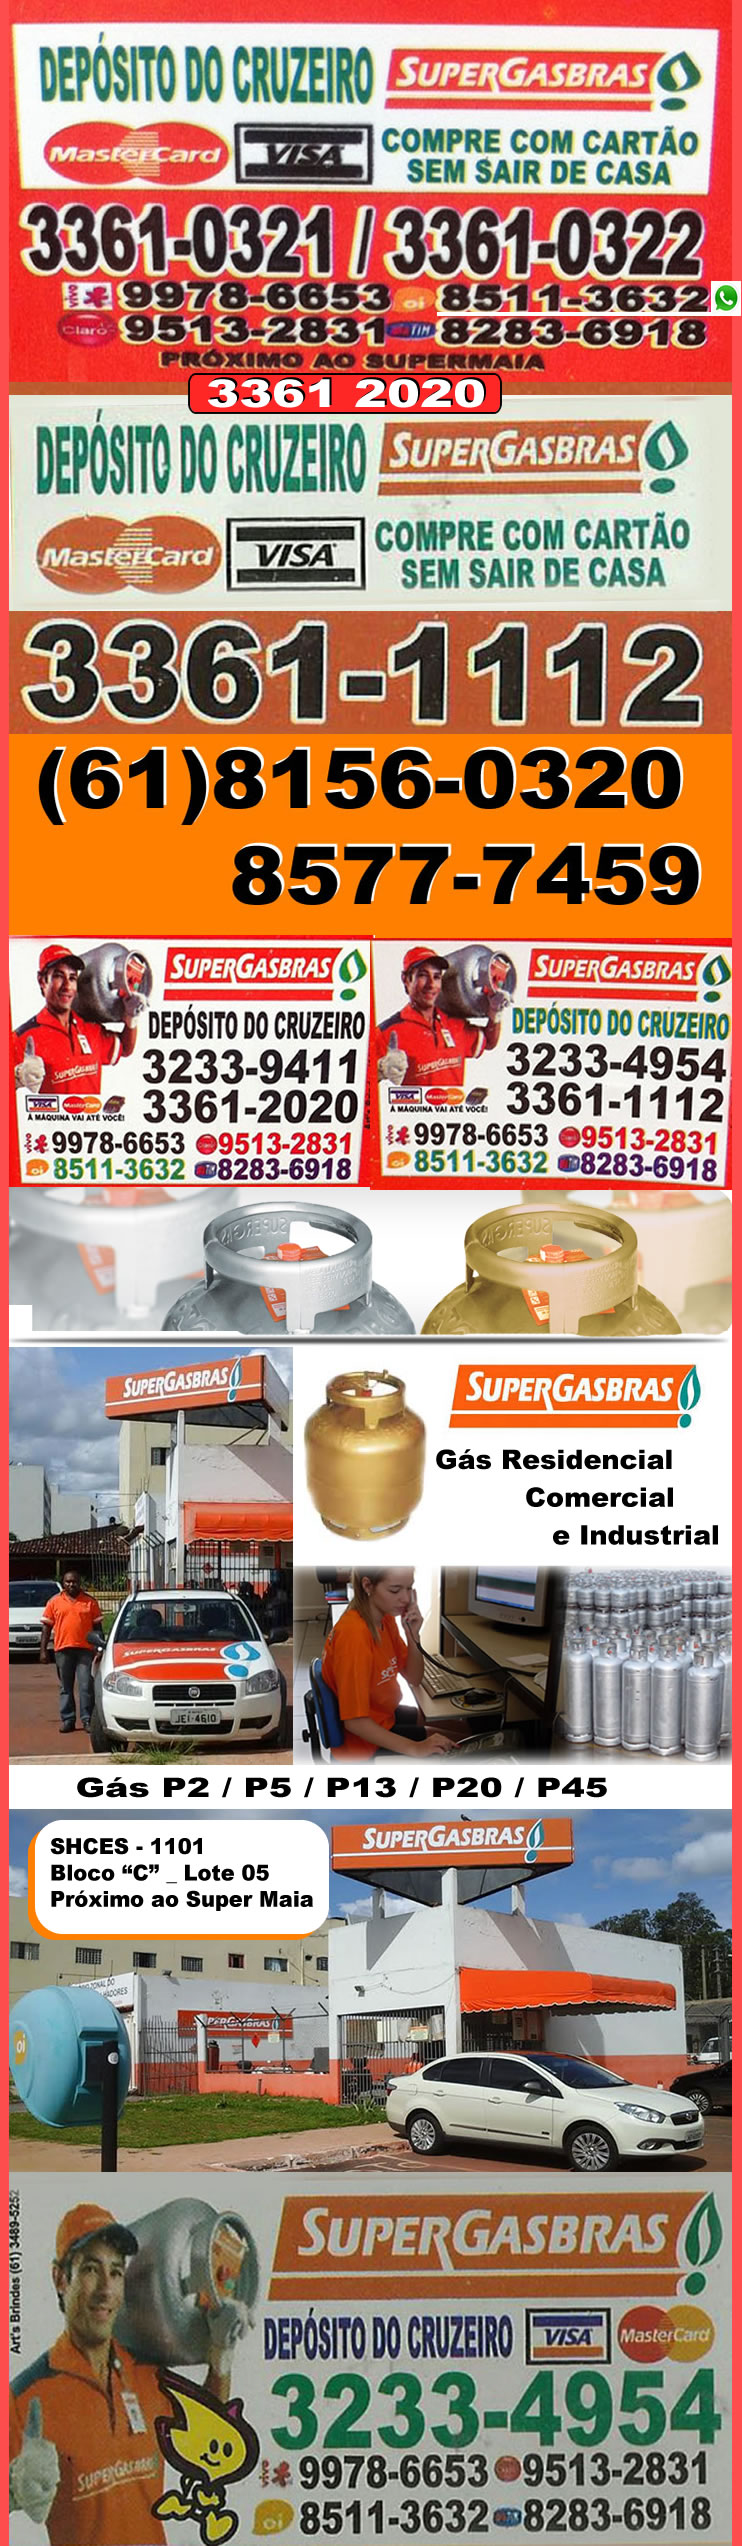 Base_SuperGas_ok Super Gás Brás _ Cruzeiro - Brasília / DF